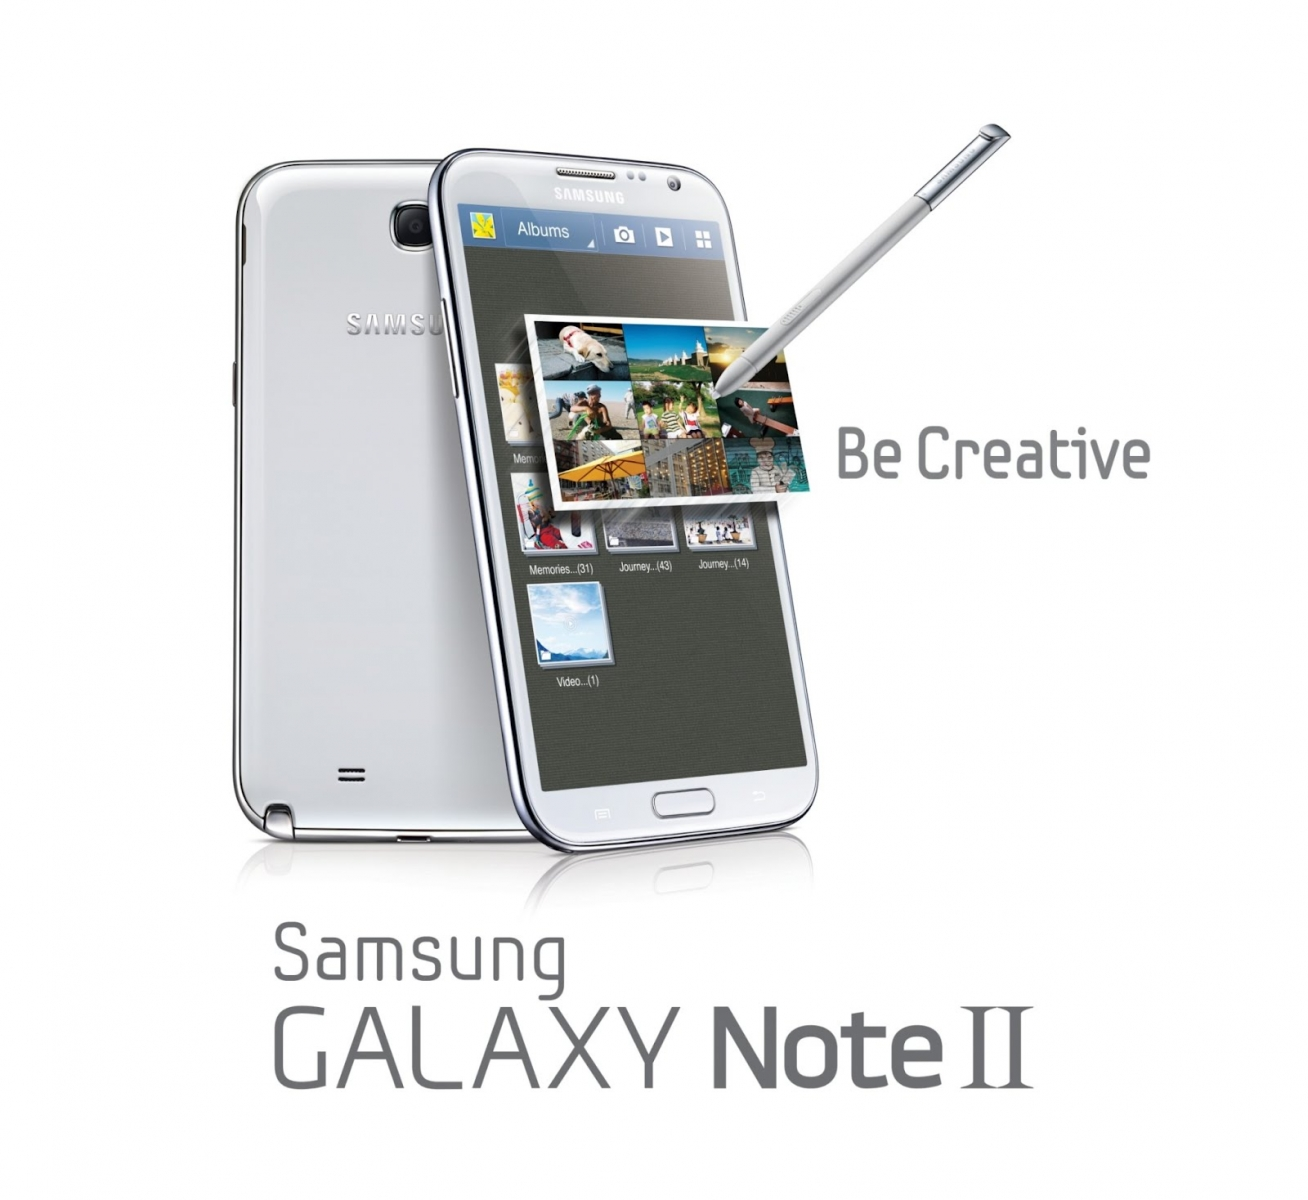 Samsung Galaxy Note II - S-Pen